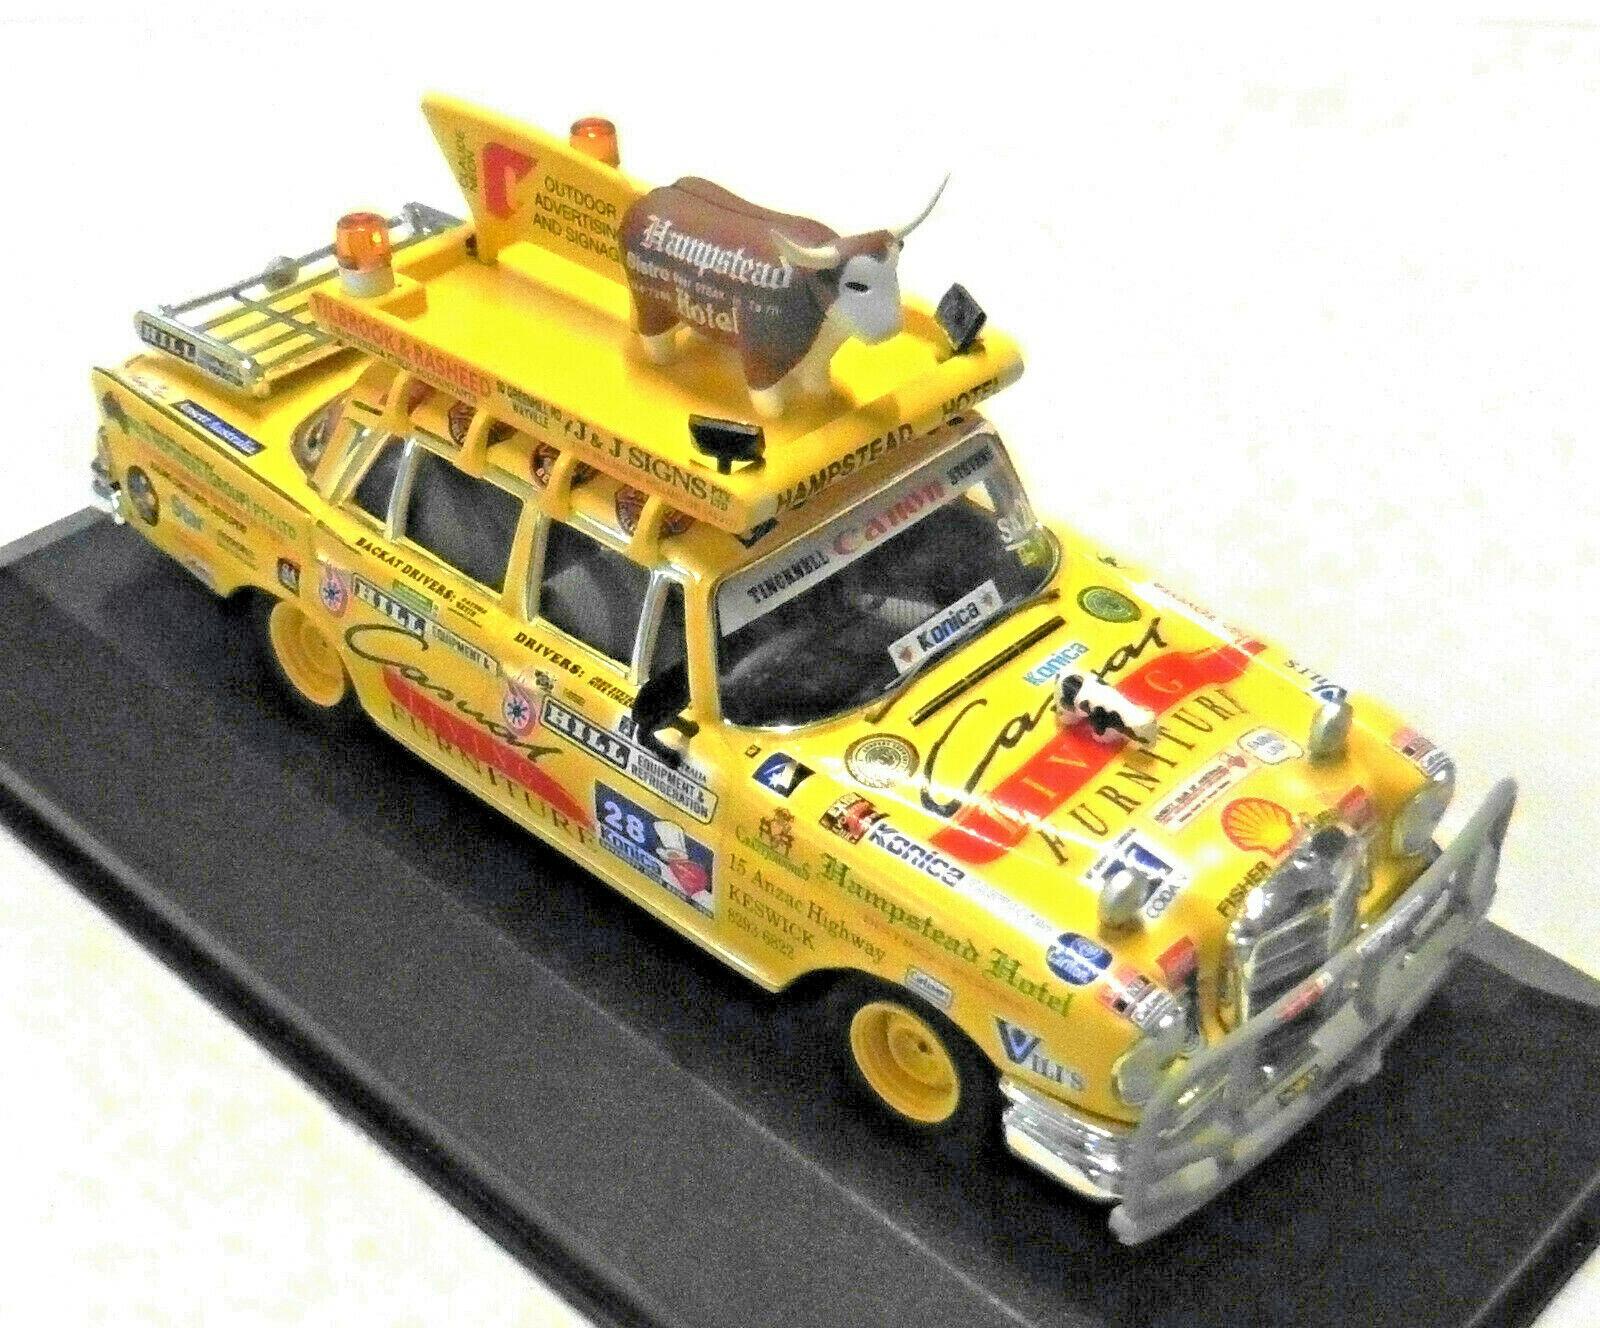 ventas calientes IXO B66040473 Mercedes-Benz 220Sb (W111)  Bush Bush Bush Bash  Werbemodell, 1 43, mb (OVP)  autorización